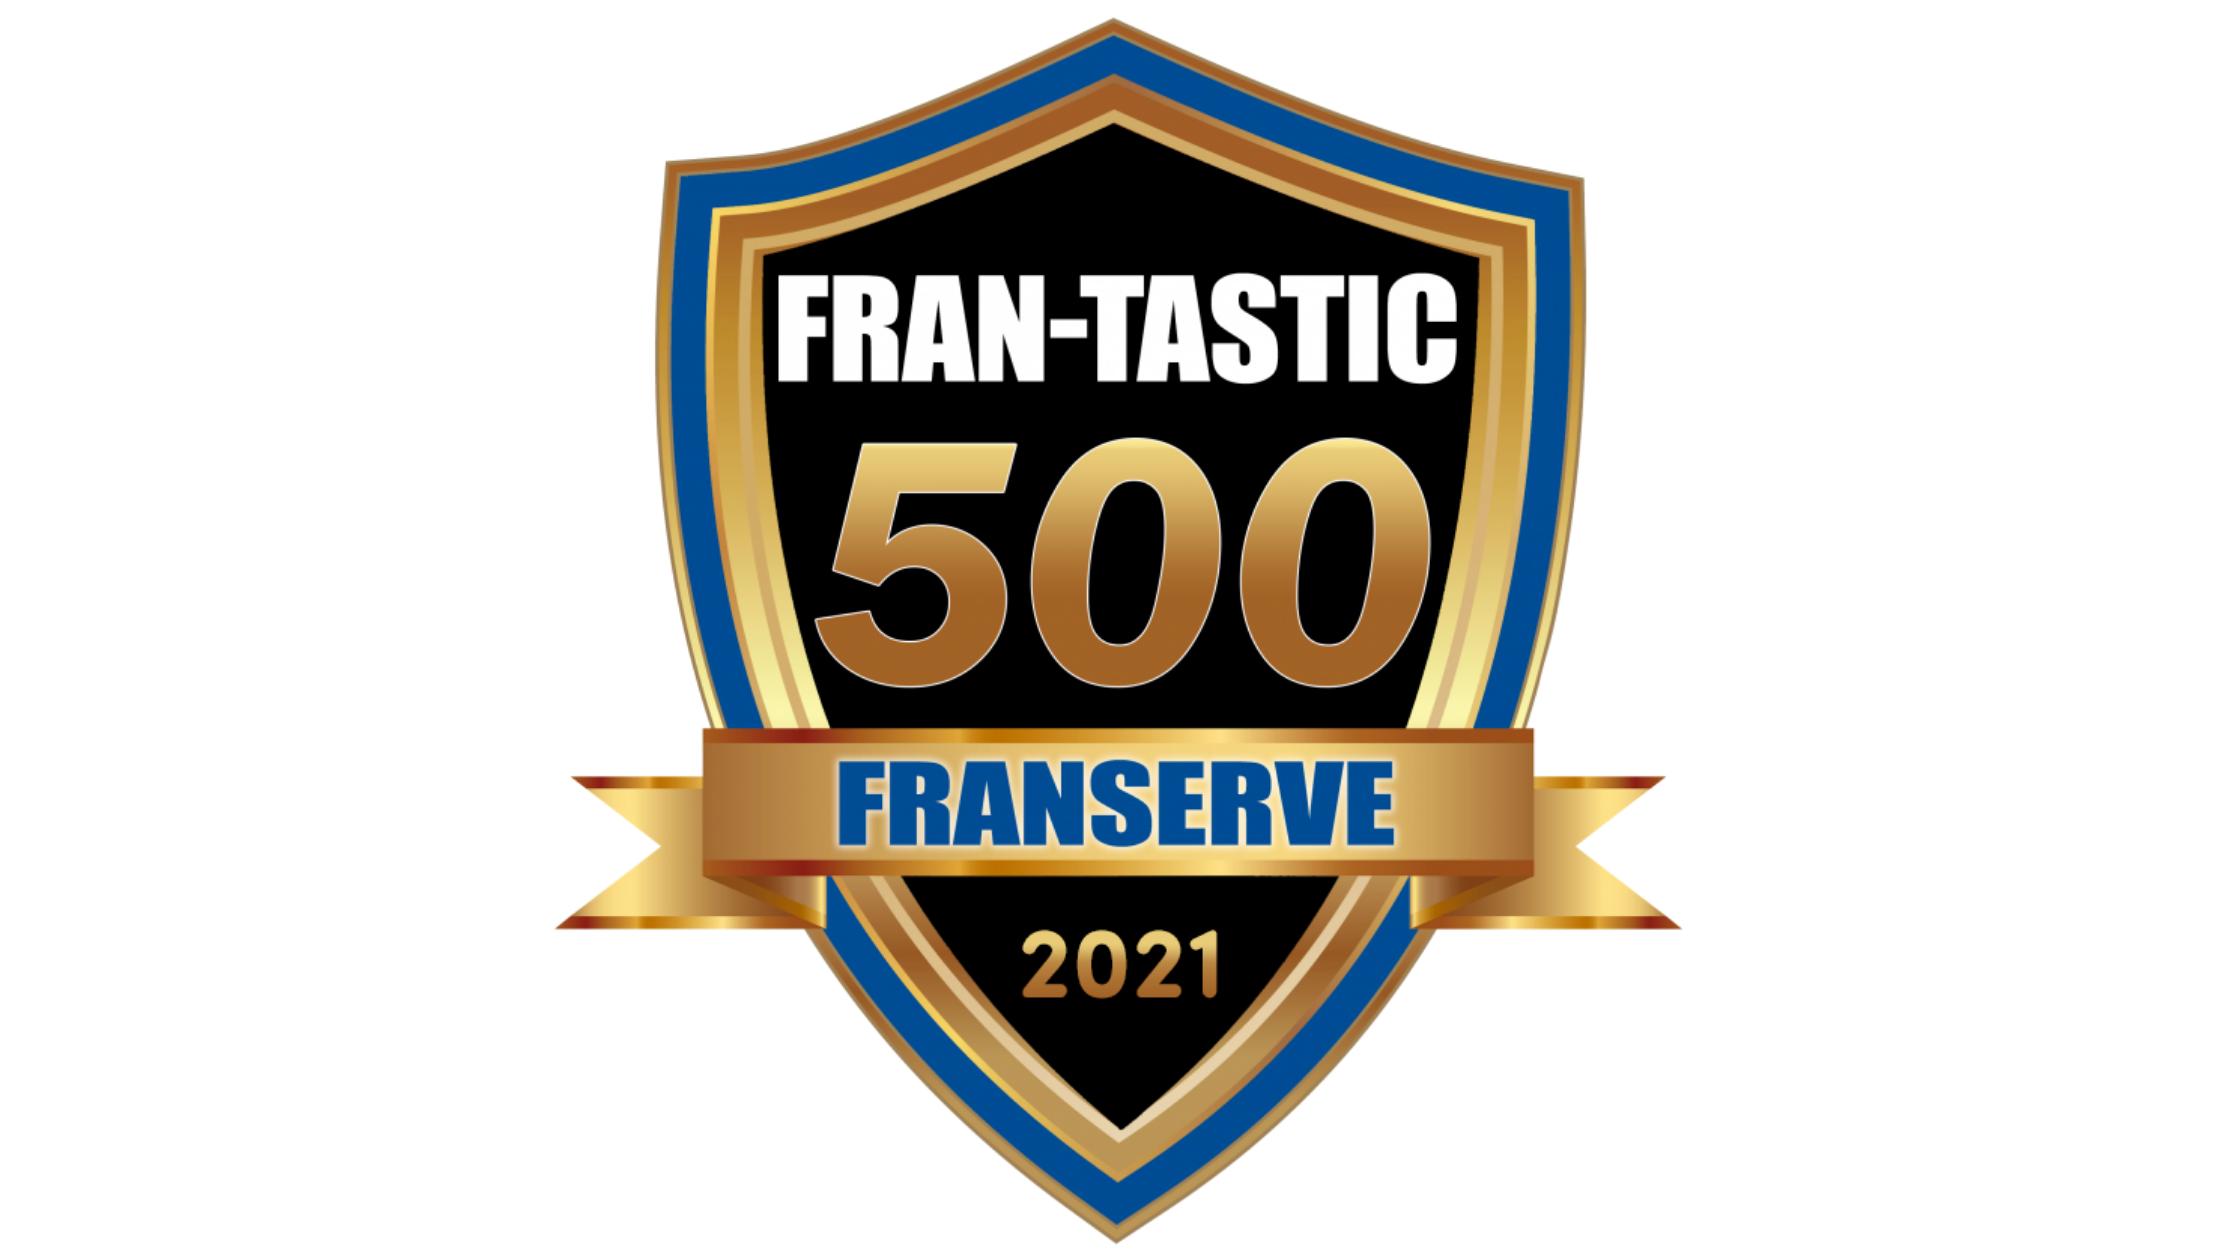 FranServe Inc FRAN-TASTIC 500 Award Logo